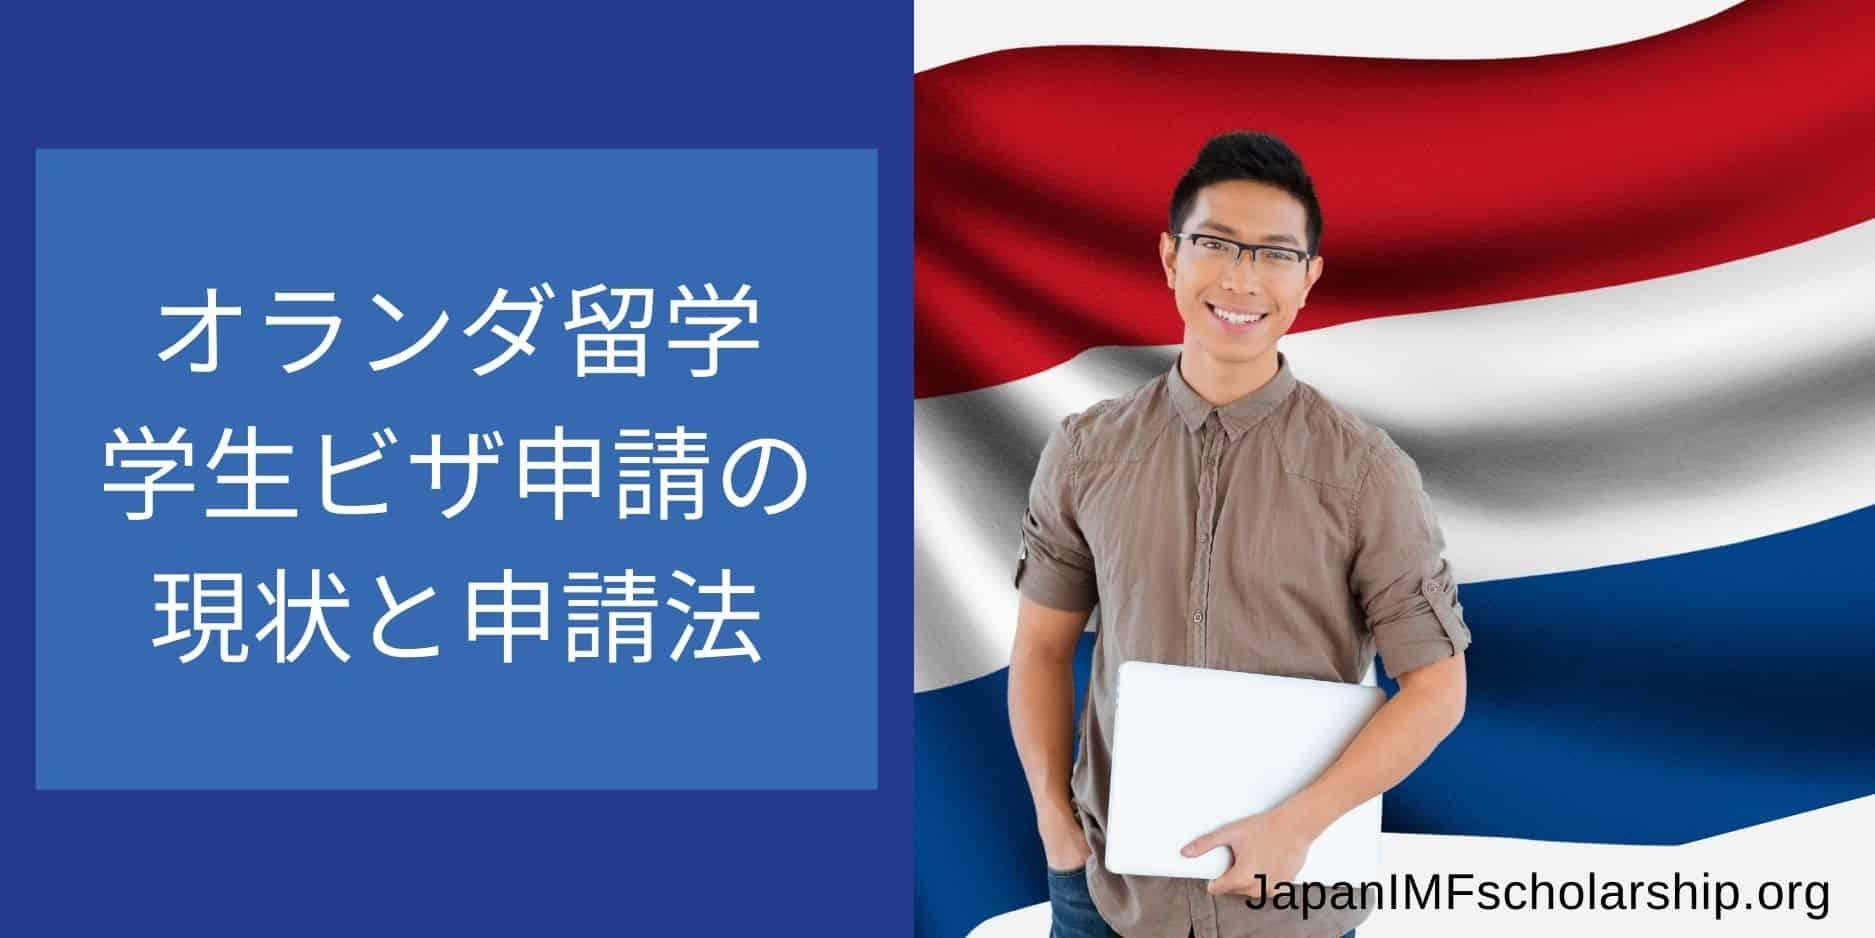 jisp how to apply netherland visa residence permit